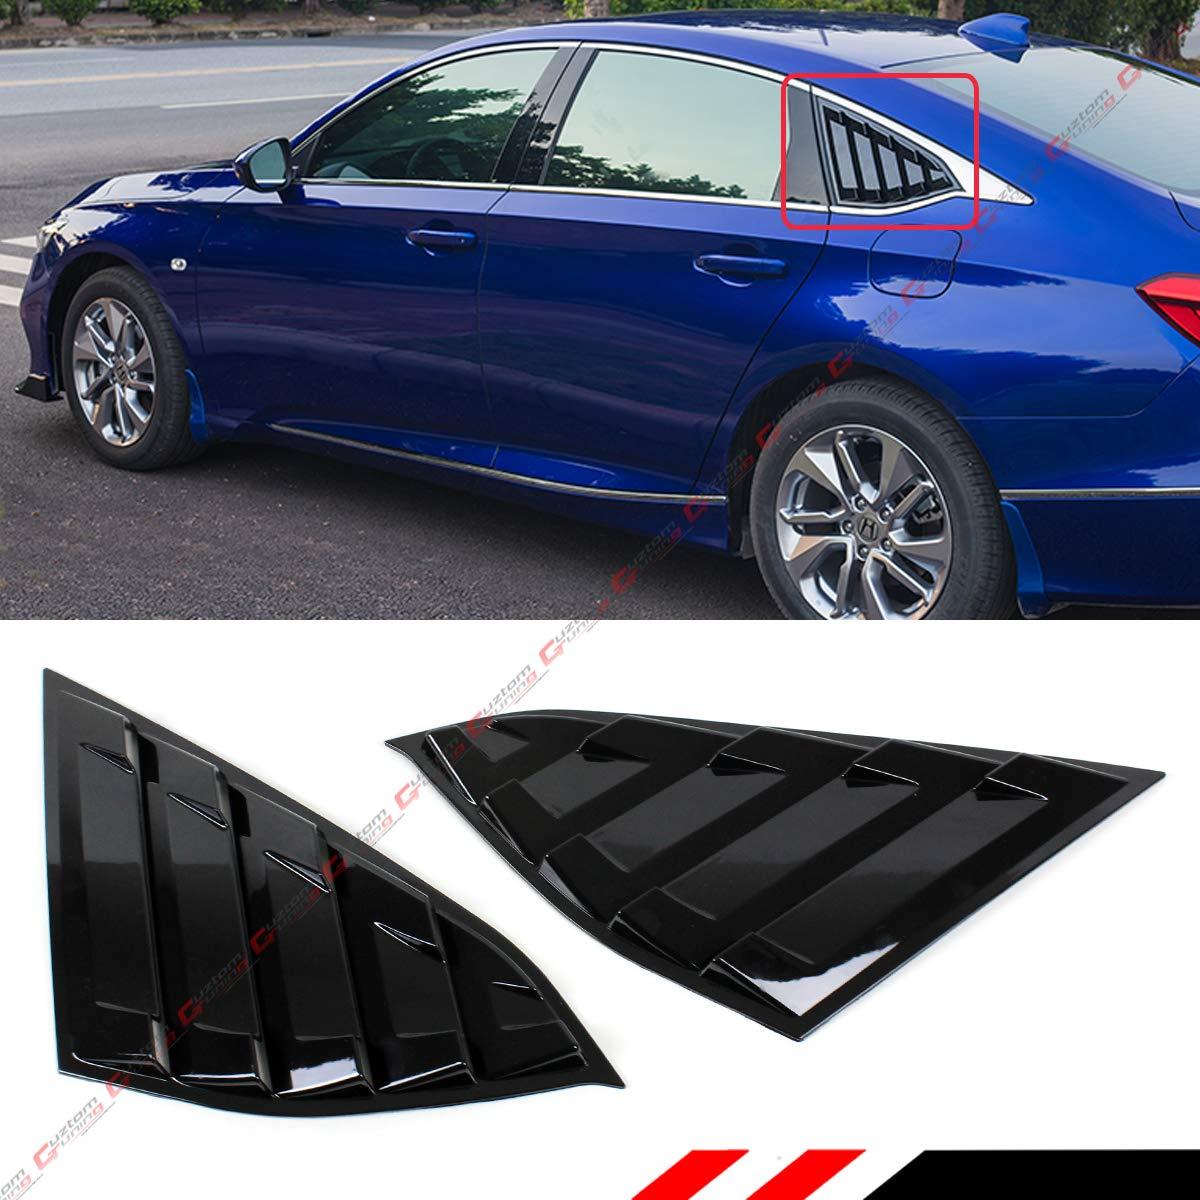 Window Side Louver Vent Trim Cover for Honda Civic Sedan 2016-2018 Gloss Black